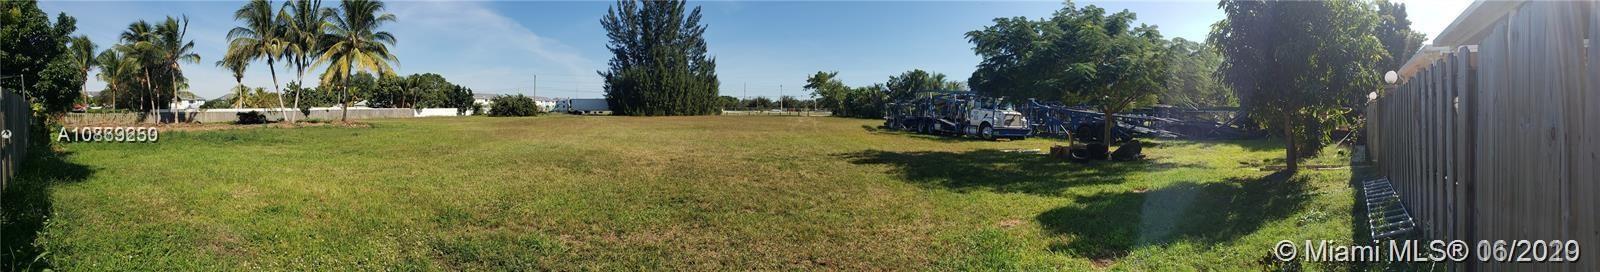 18200 SW 108 Av, Unincorporated Dade County, FL 33157